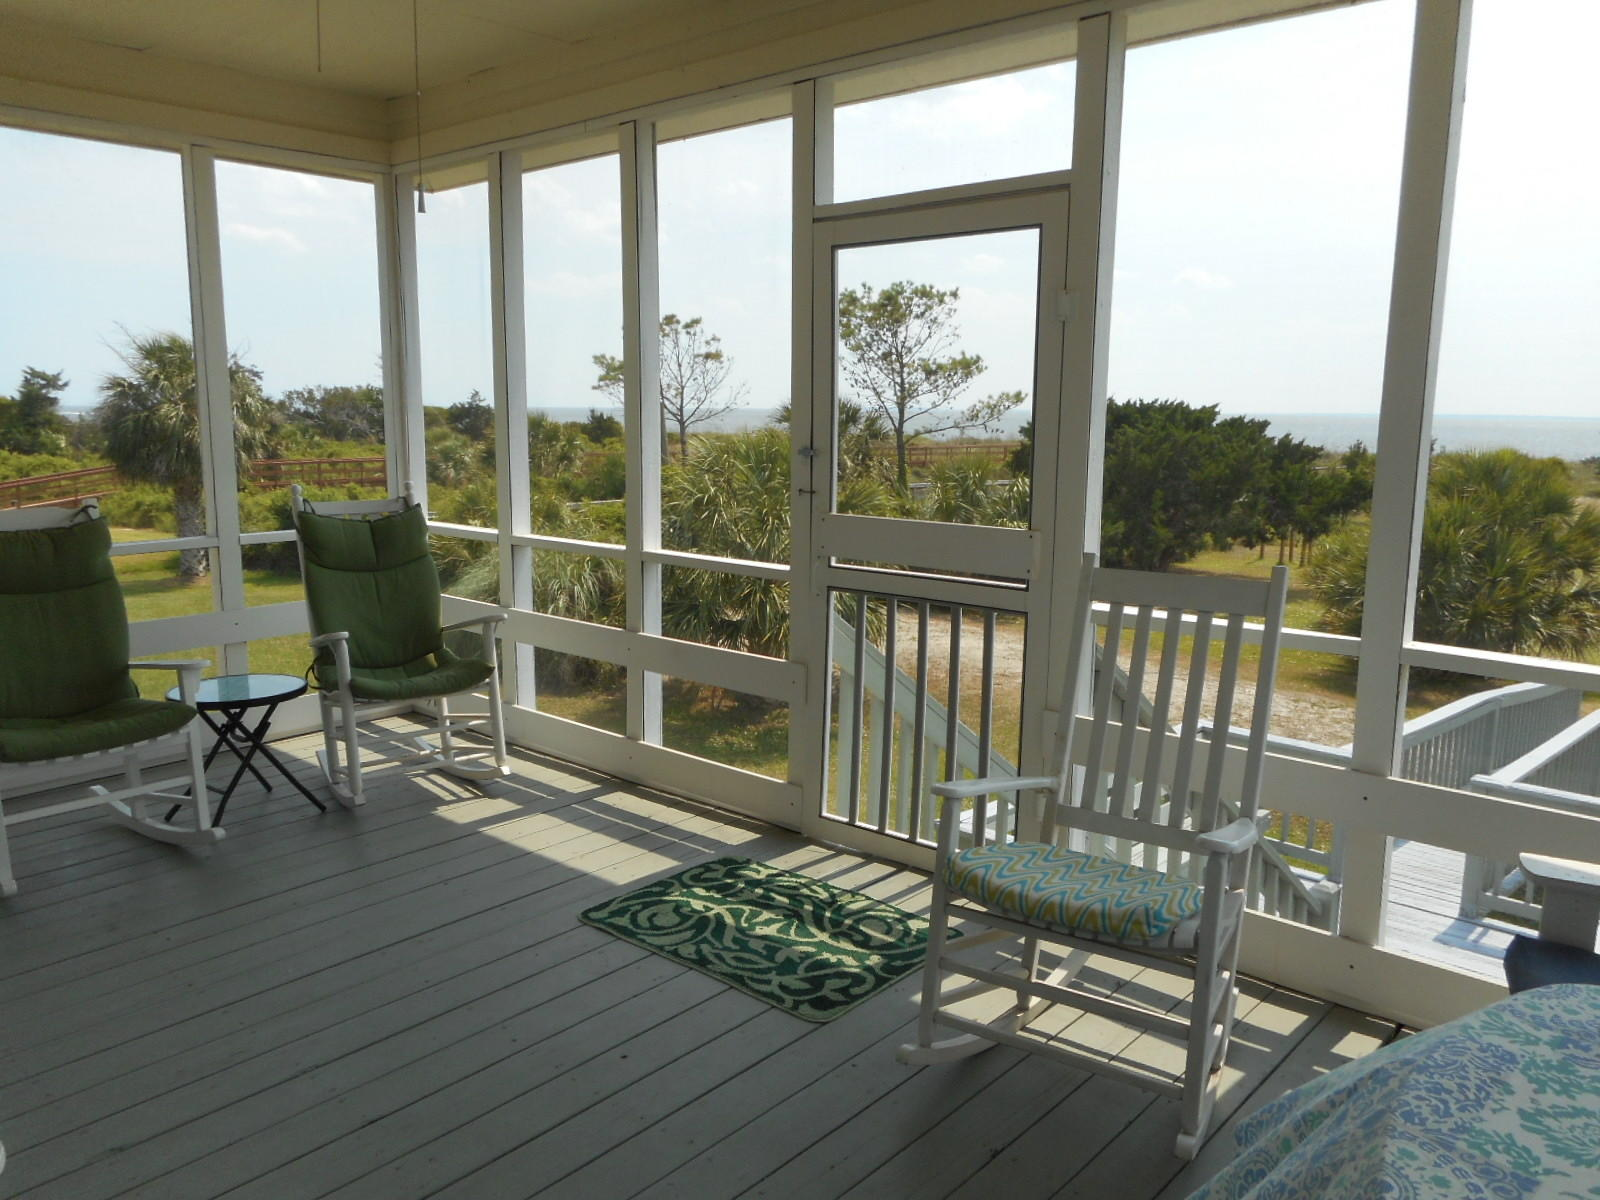 Beachfront Homes For Sale - 3608 Yacht Club, Edisto Beach, SC - 33